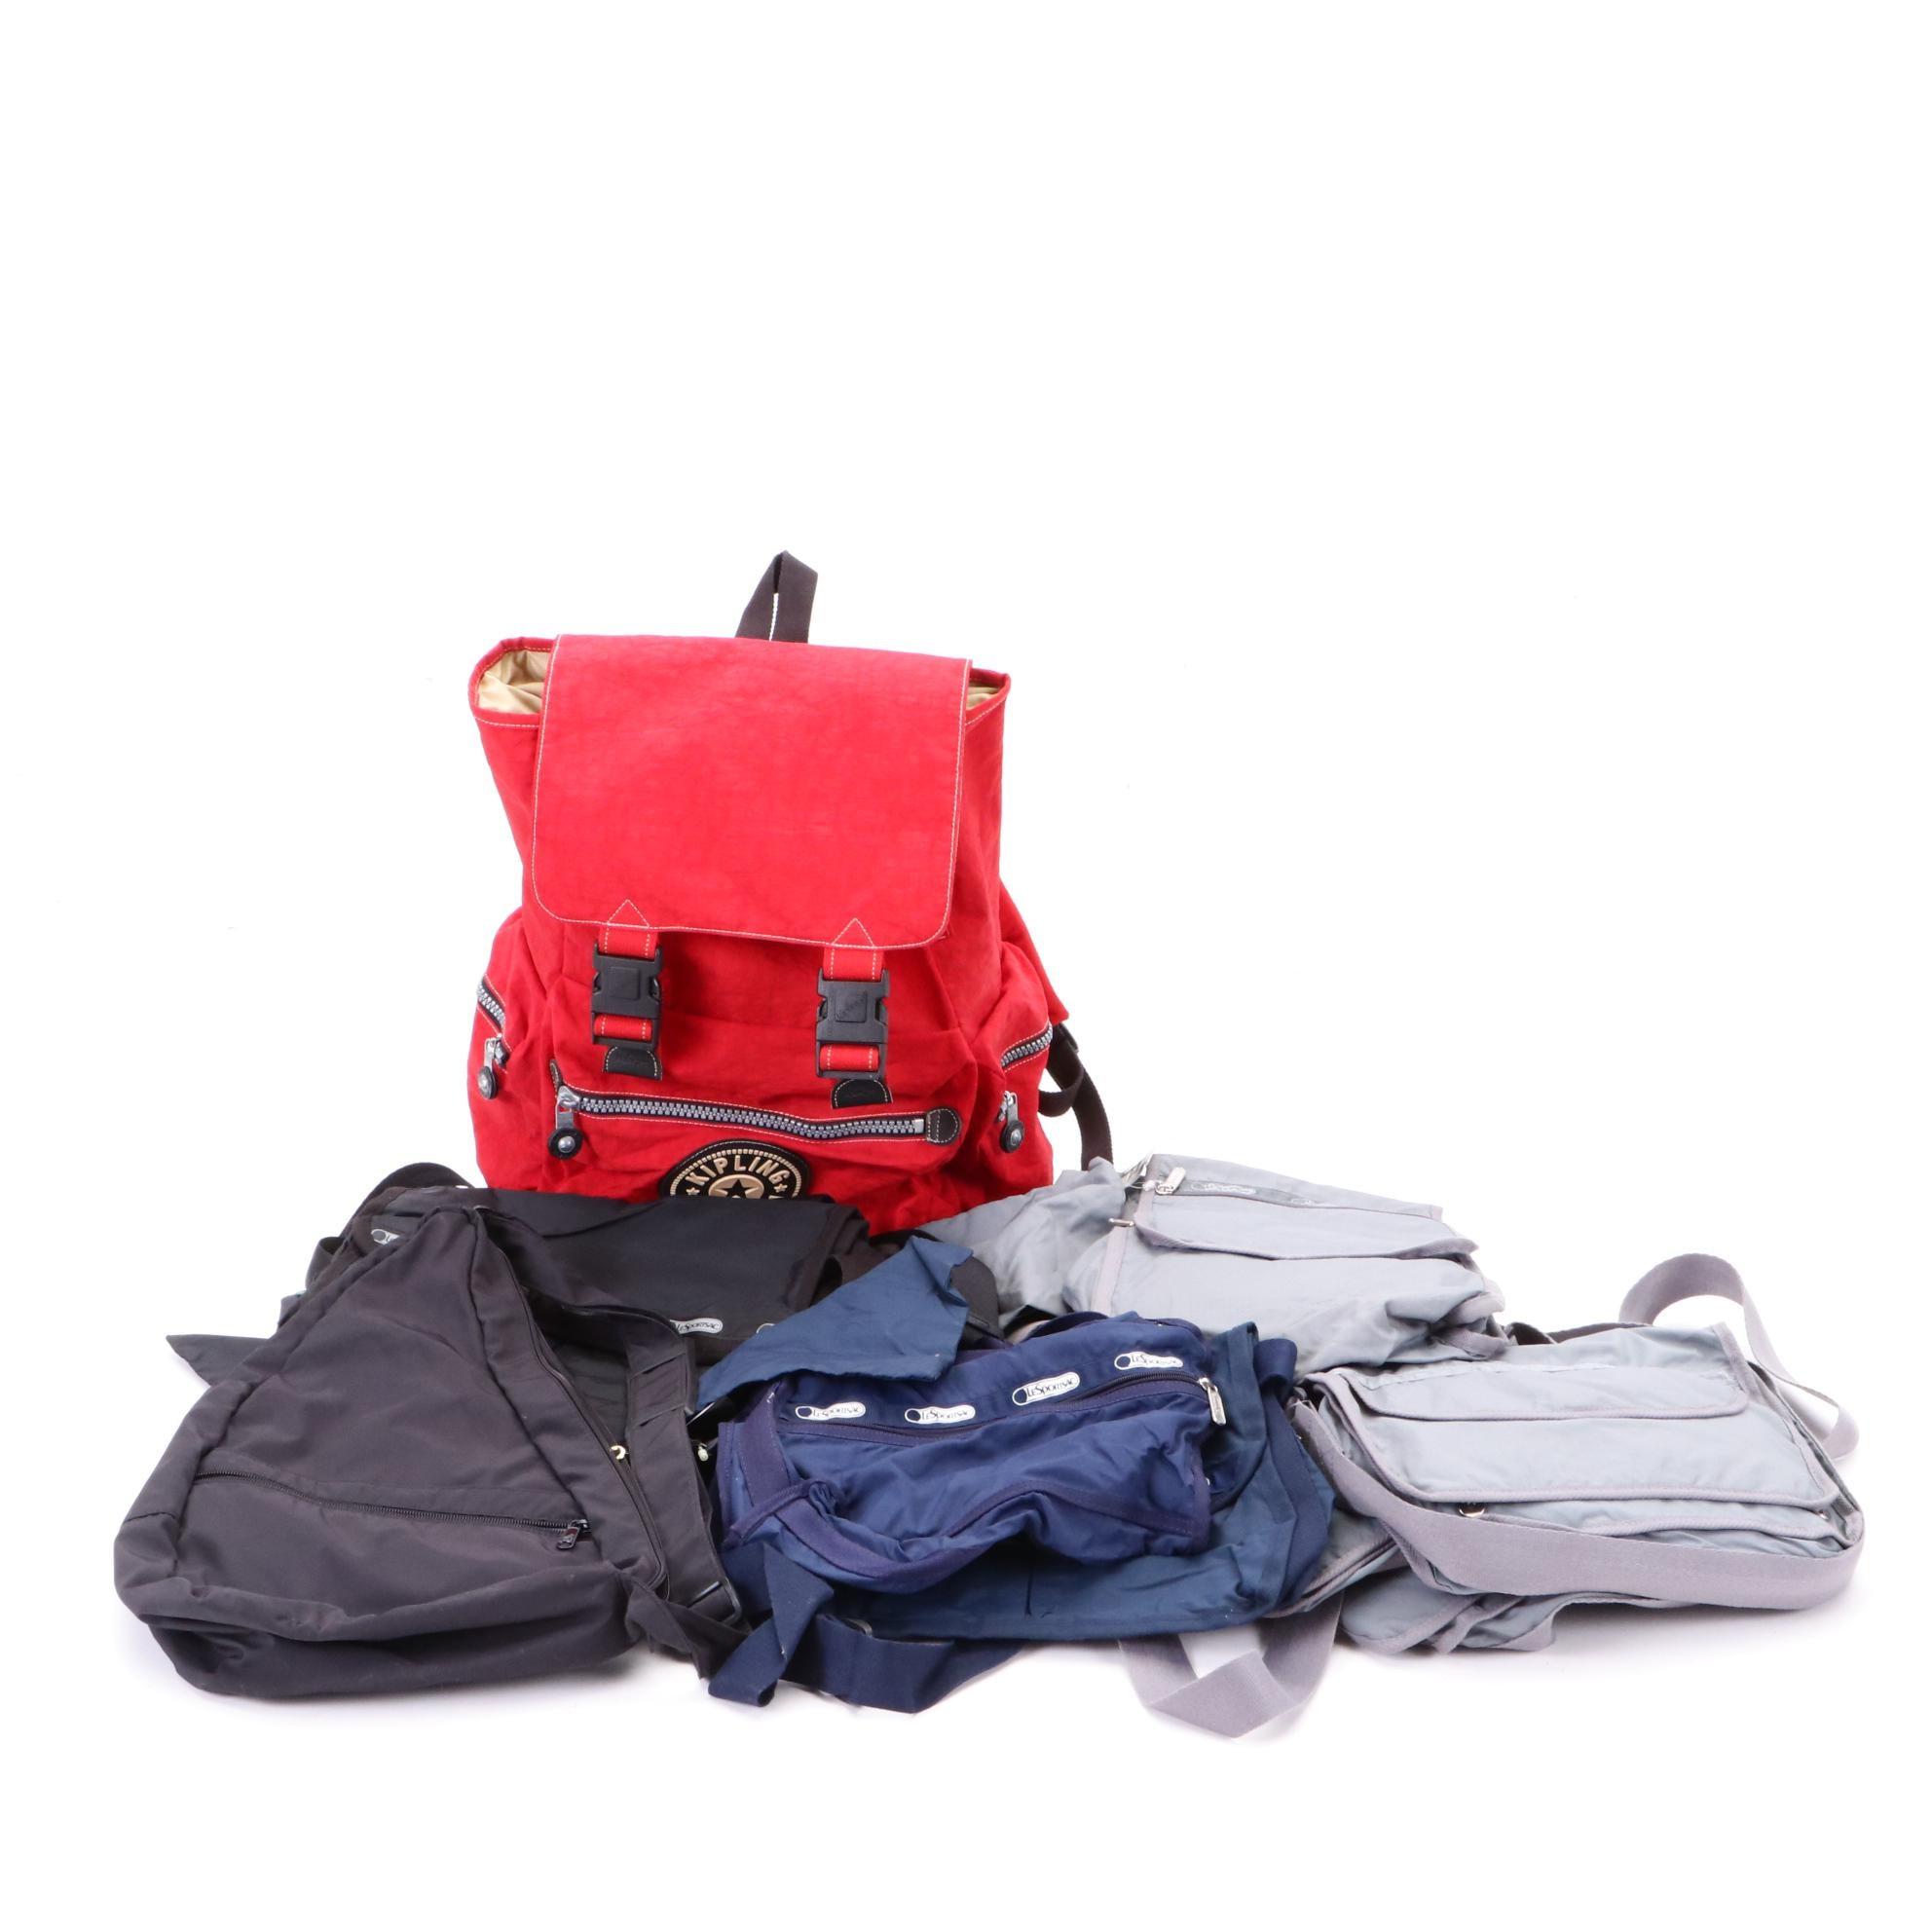 Kipling, LeSportsac and AmeriBag Backpacks and Shoulder Bags